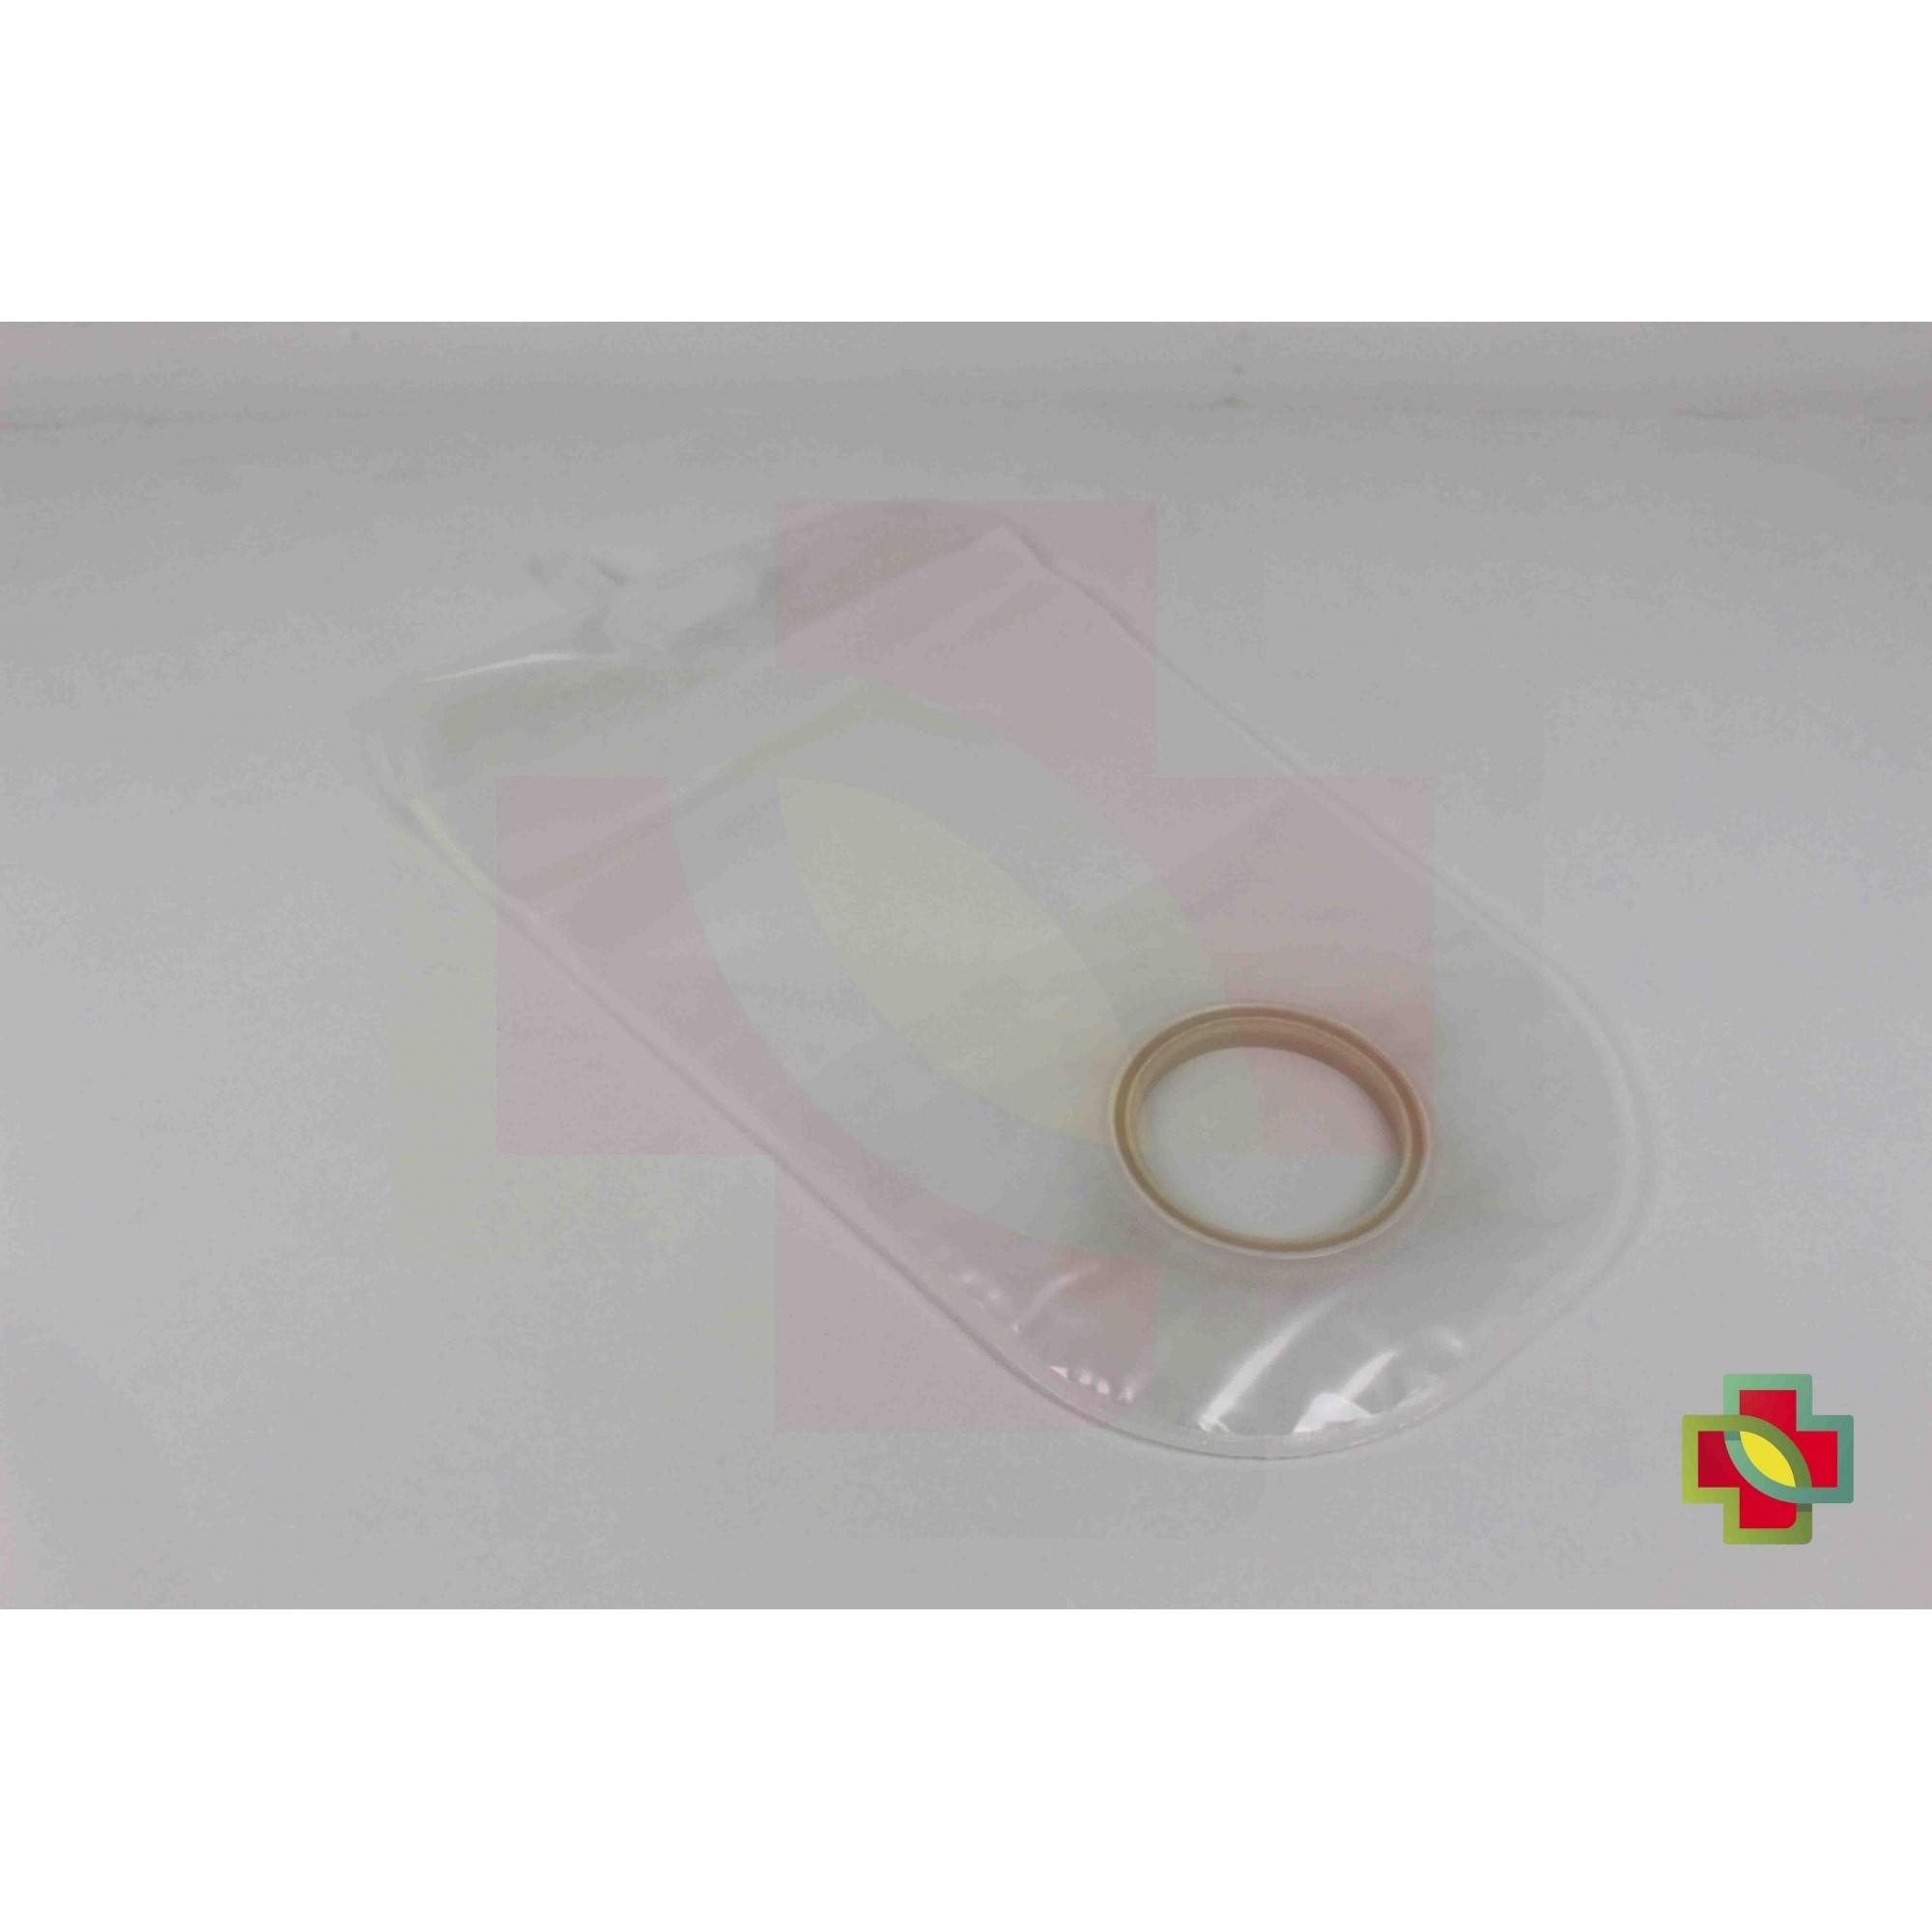 BOLSA DE UROSTOMIA SUR-FIT PLUS TRANSP.ANTI-REFLUXO 45MM (UND.) 402550 - CONVATEC